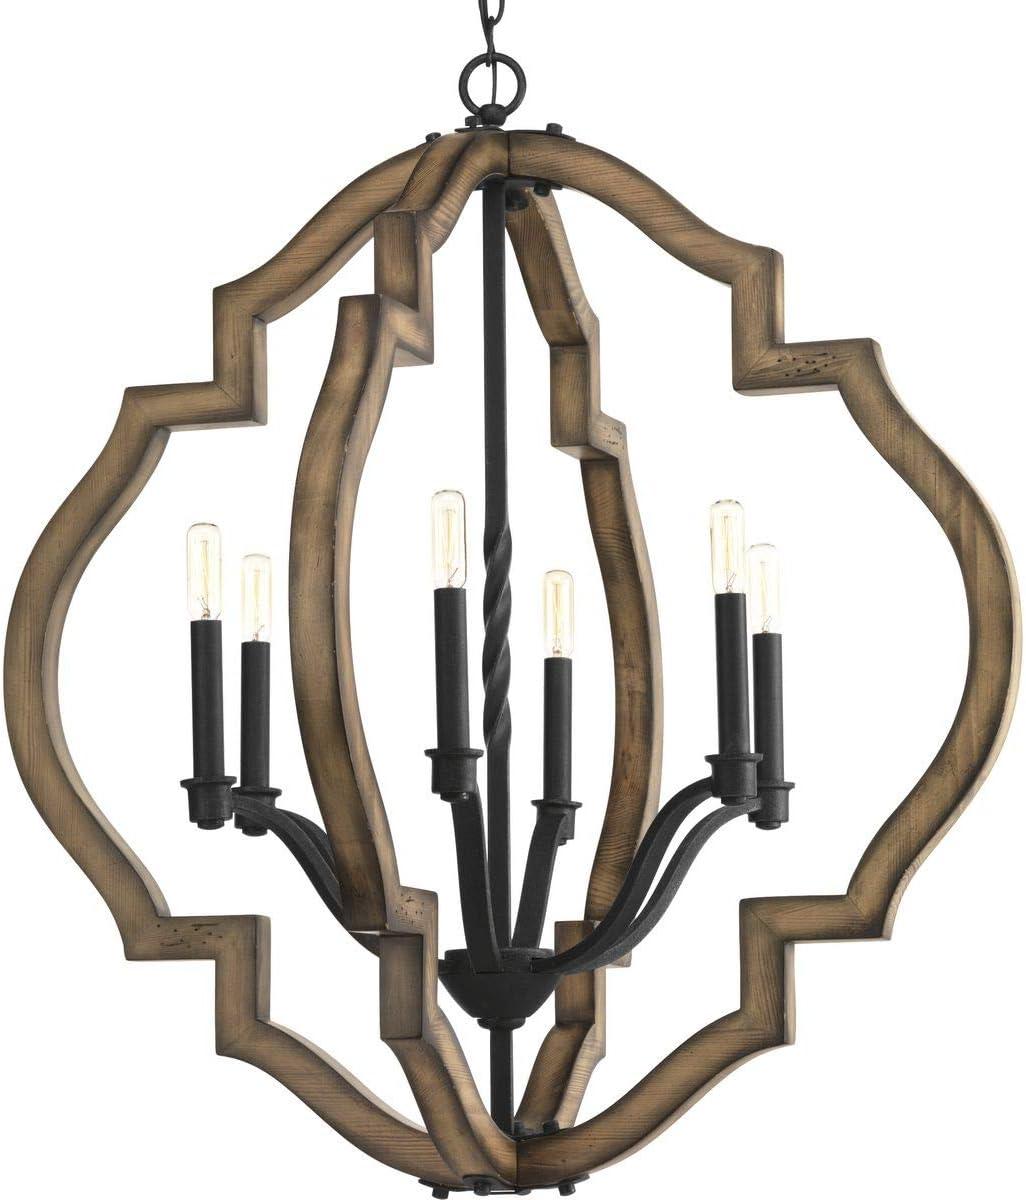 Progress Louisville-Jefferson County Mall Lighting P4767-71 Spicewood Six-Light Gilde Ranking TOP2 Chandelier